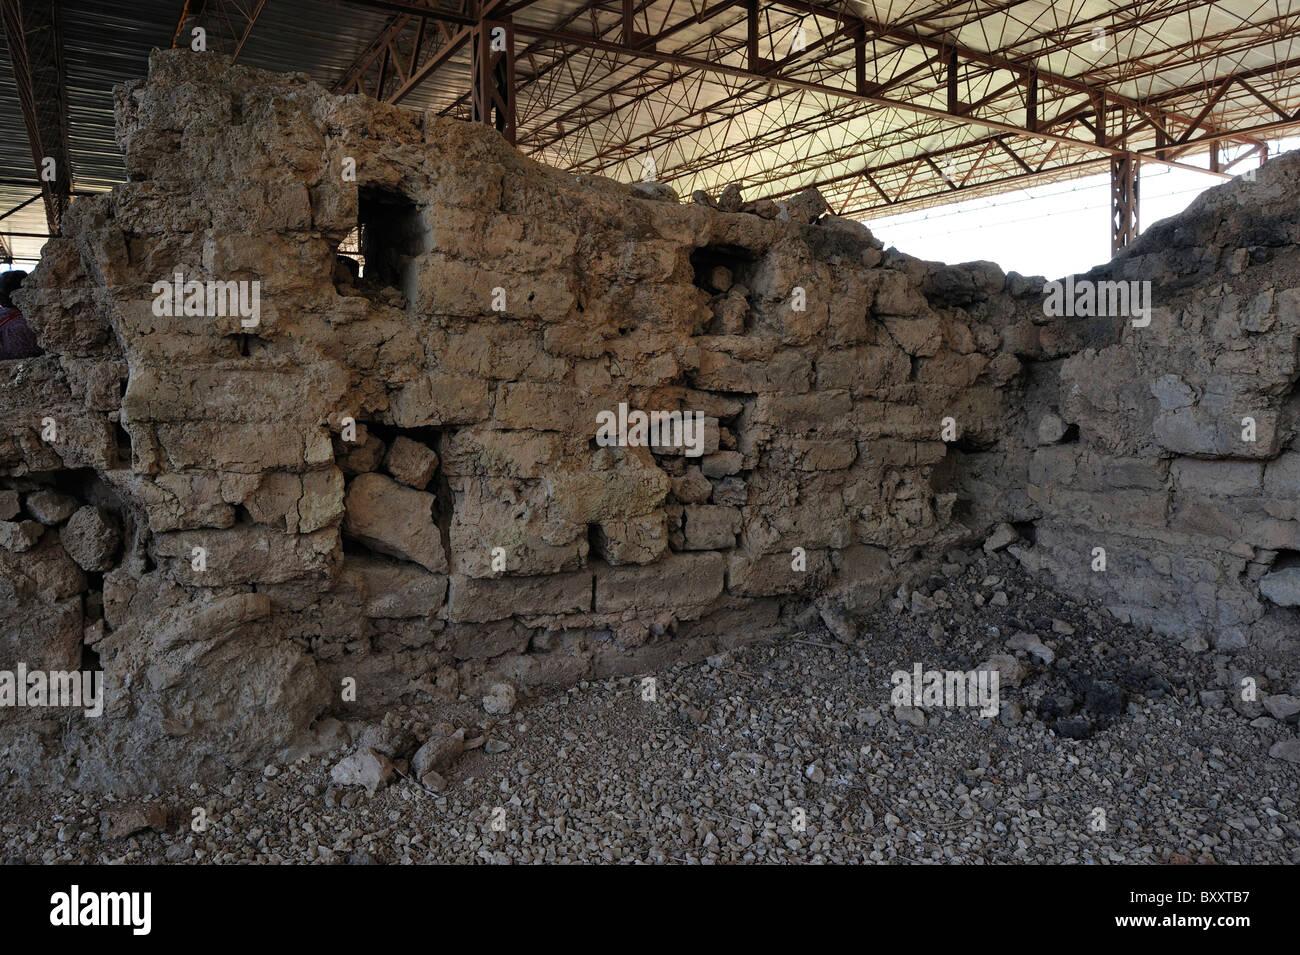 Mud brick walls of the palace, Turkey 100921_36596 - Stock Image